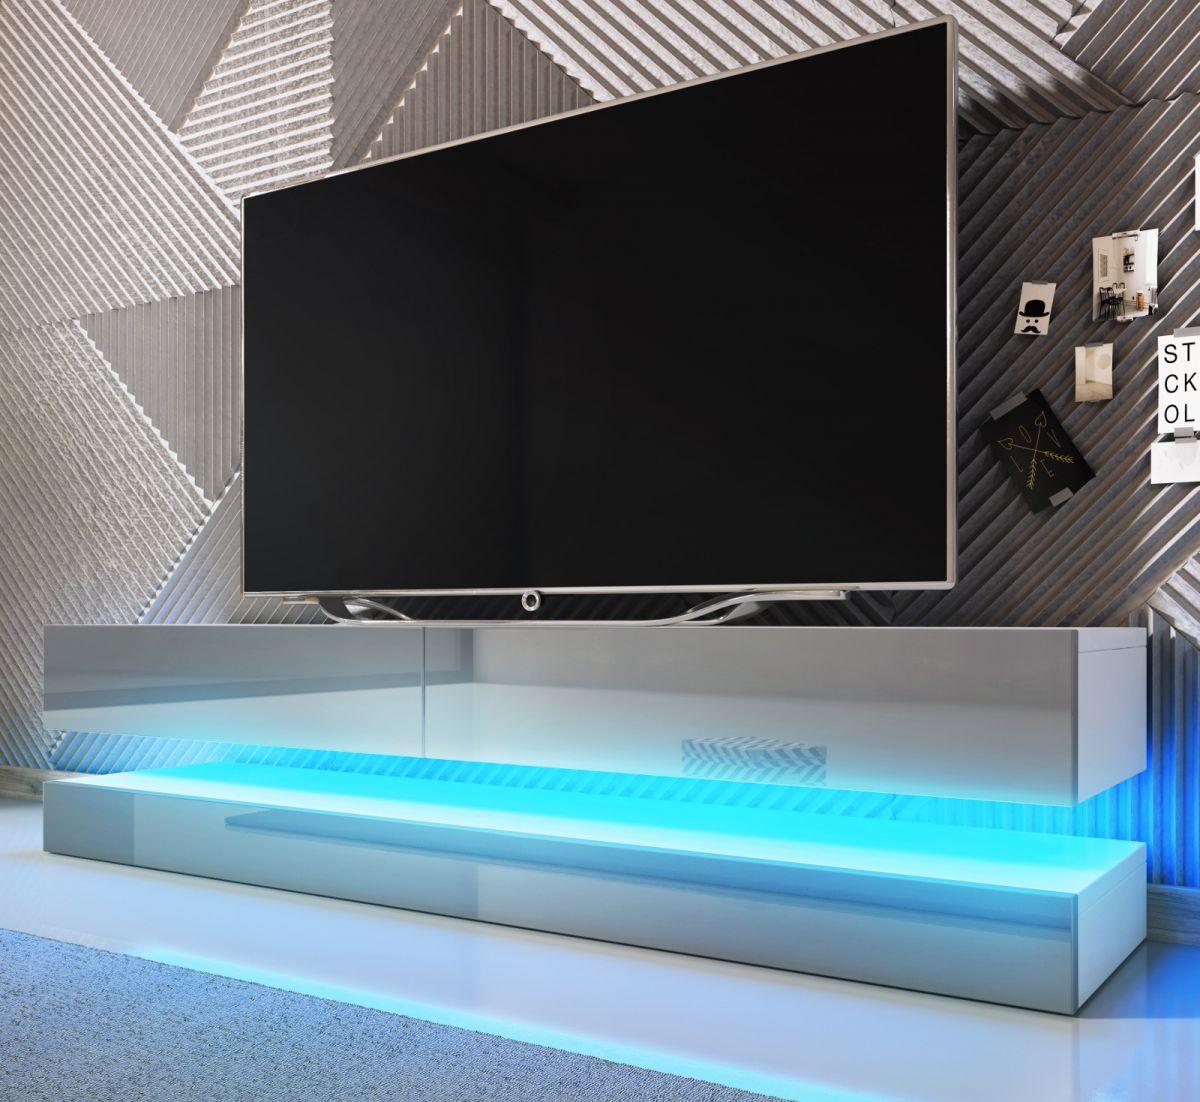 TV-Lowboard Bird Hochglanz grau mit Beleuchtung 140 cm